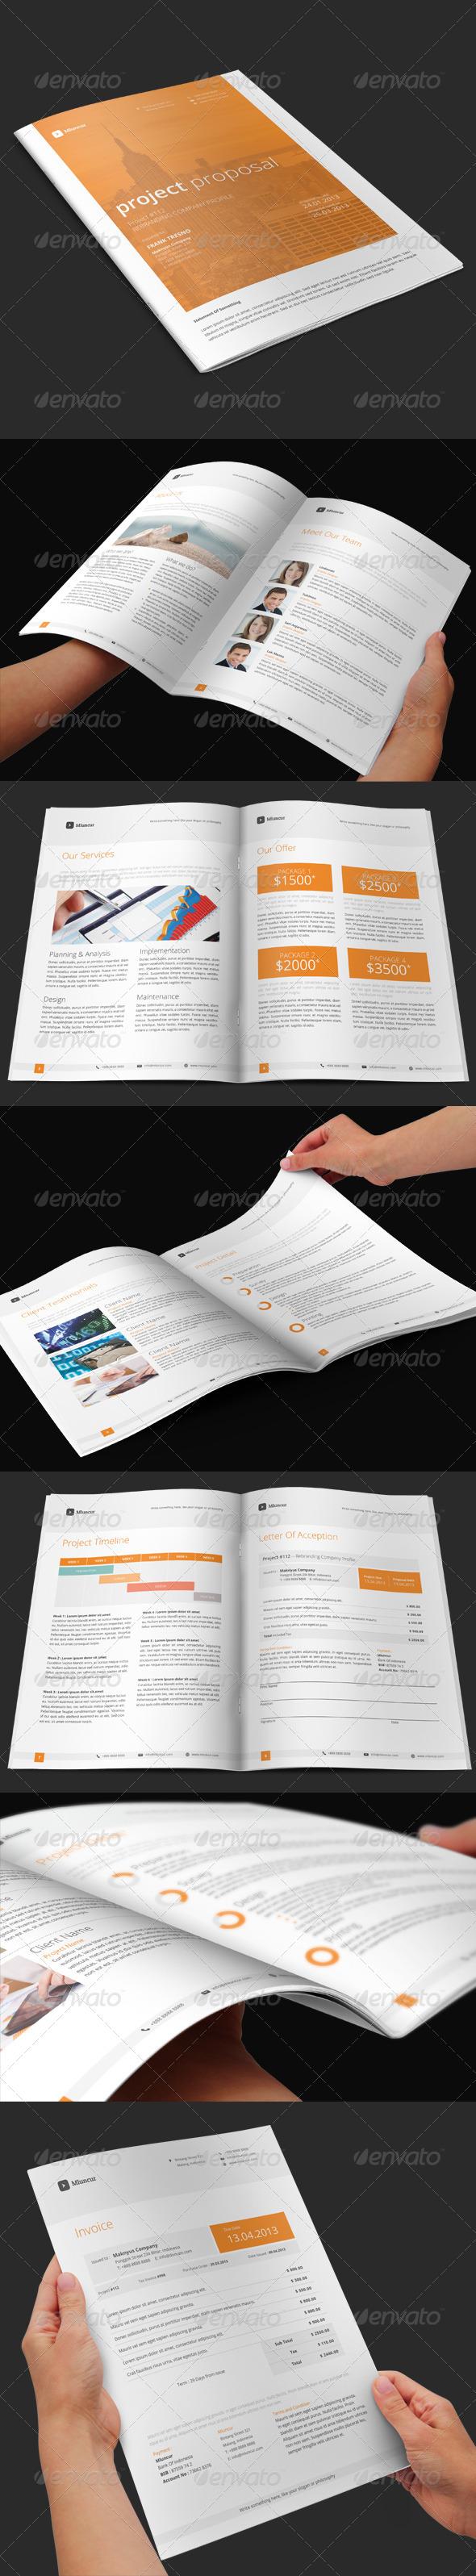 GraphicRiver Mluncur Proposal 5284888